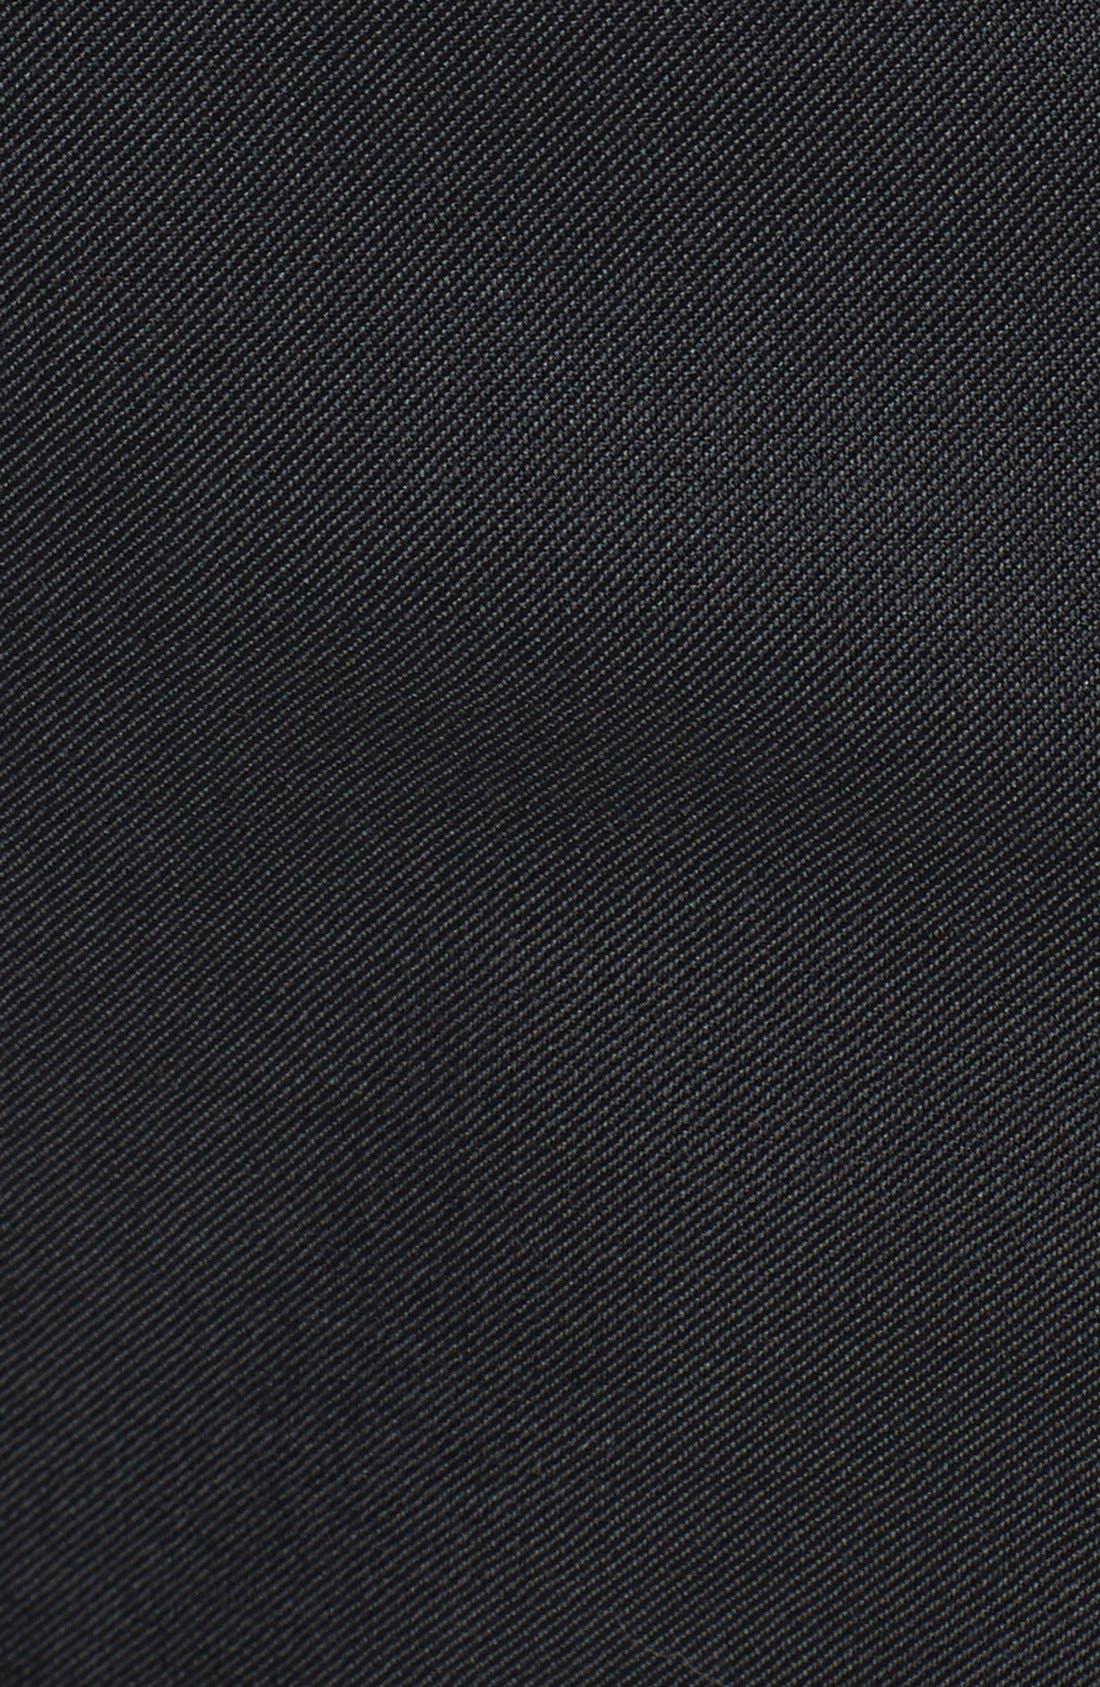 Huge/Genius Trim Fit Wool Suit,                             Alternate thumbnail 9, color,                             021